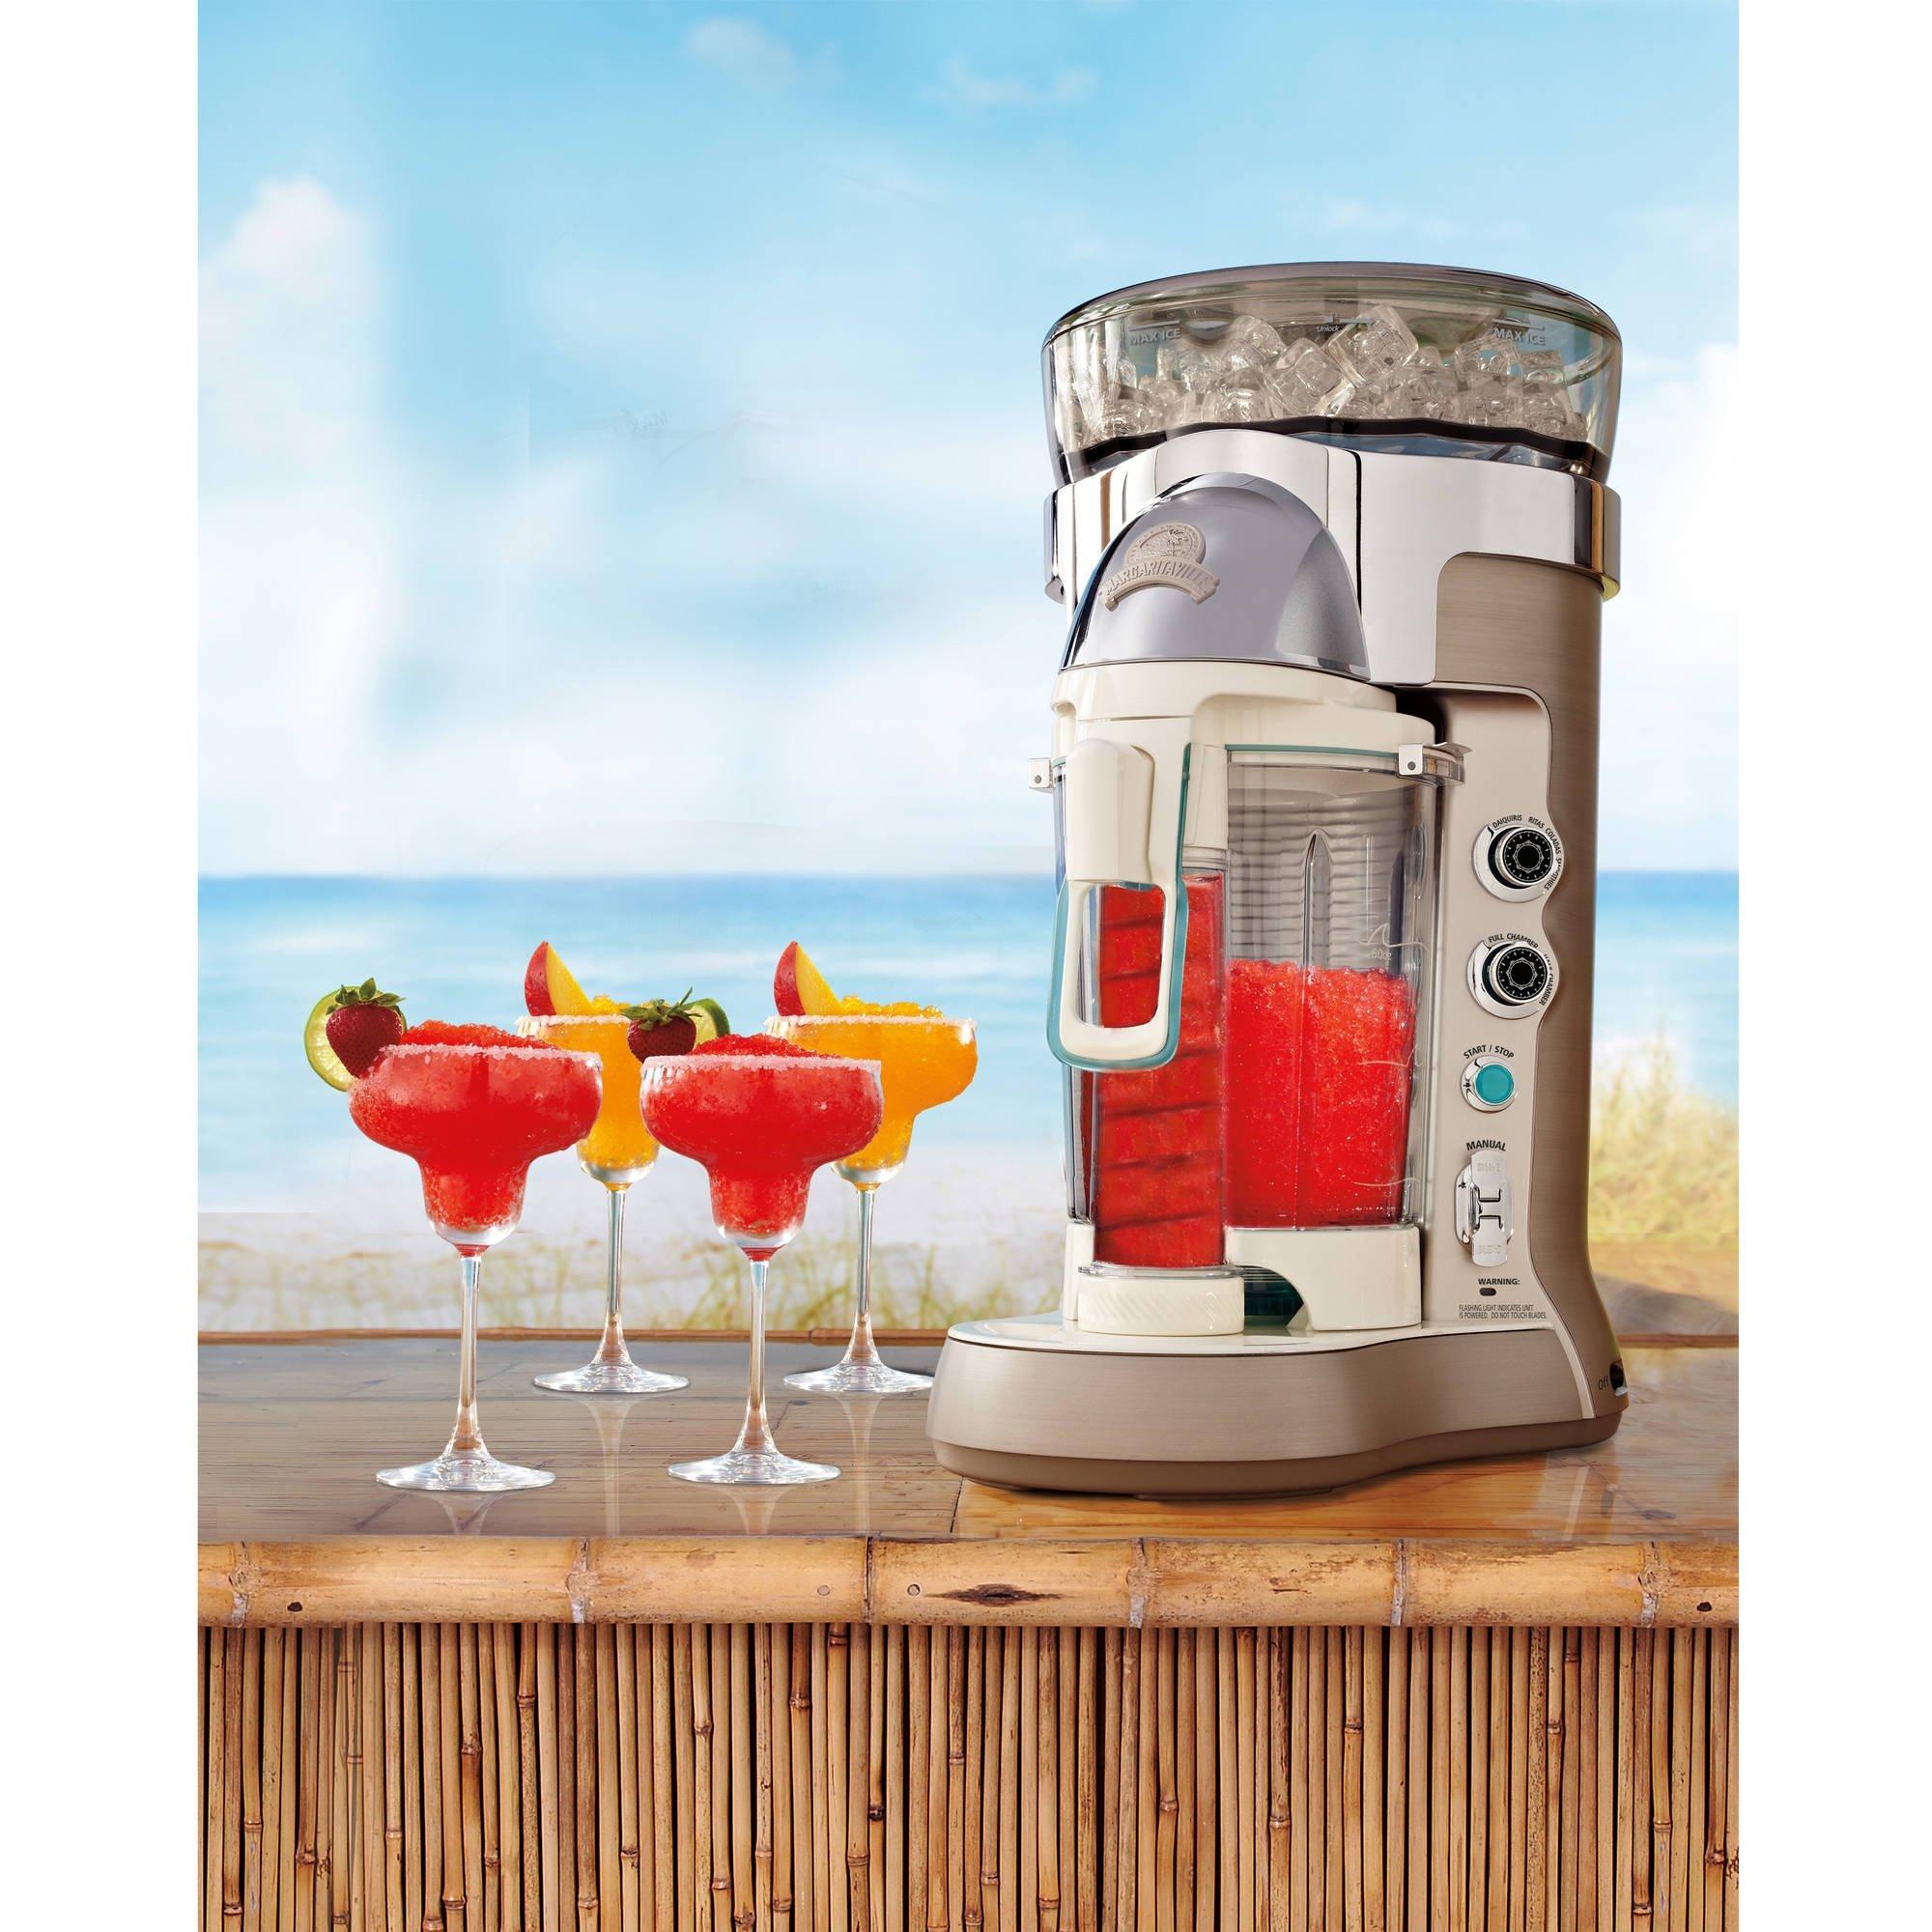 Margaritaville Bali Frozen Concoction Maker with Self Dispenser, DM3500-000-000